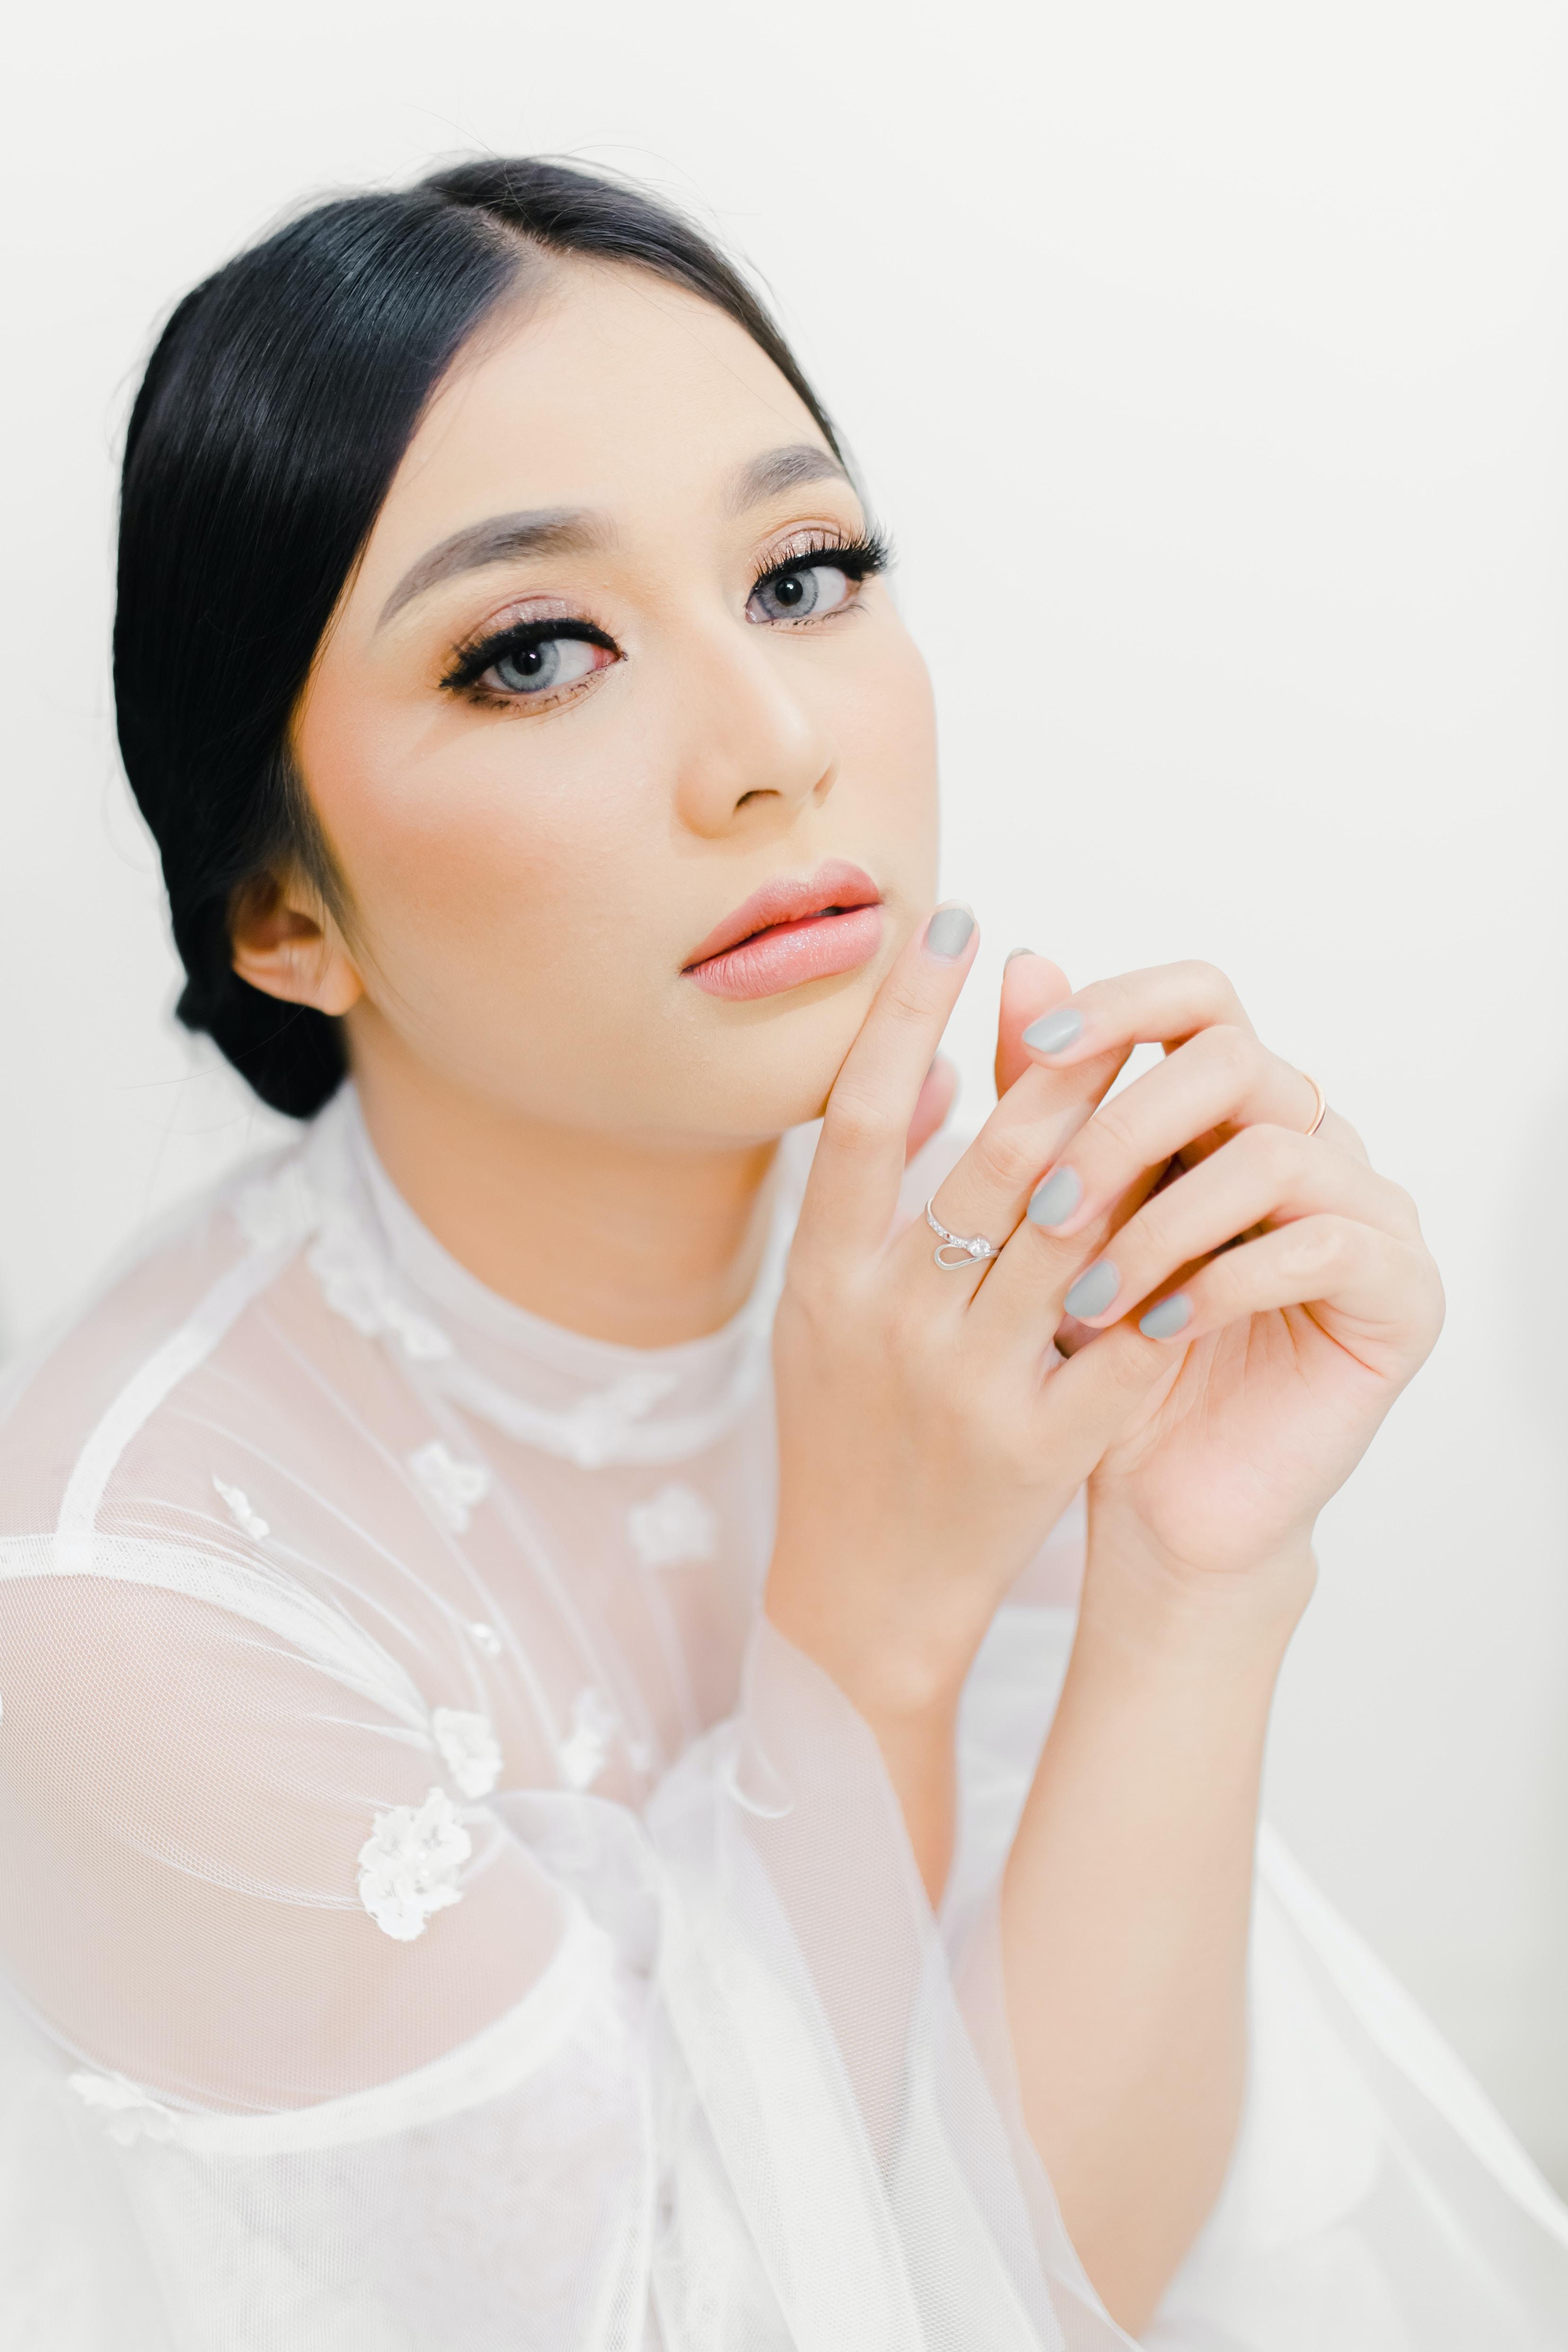 Personal portraits Ms.Putri Rahmania